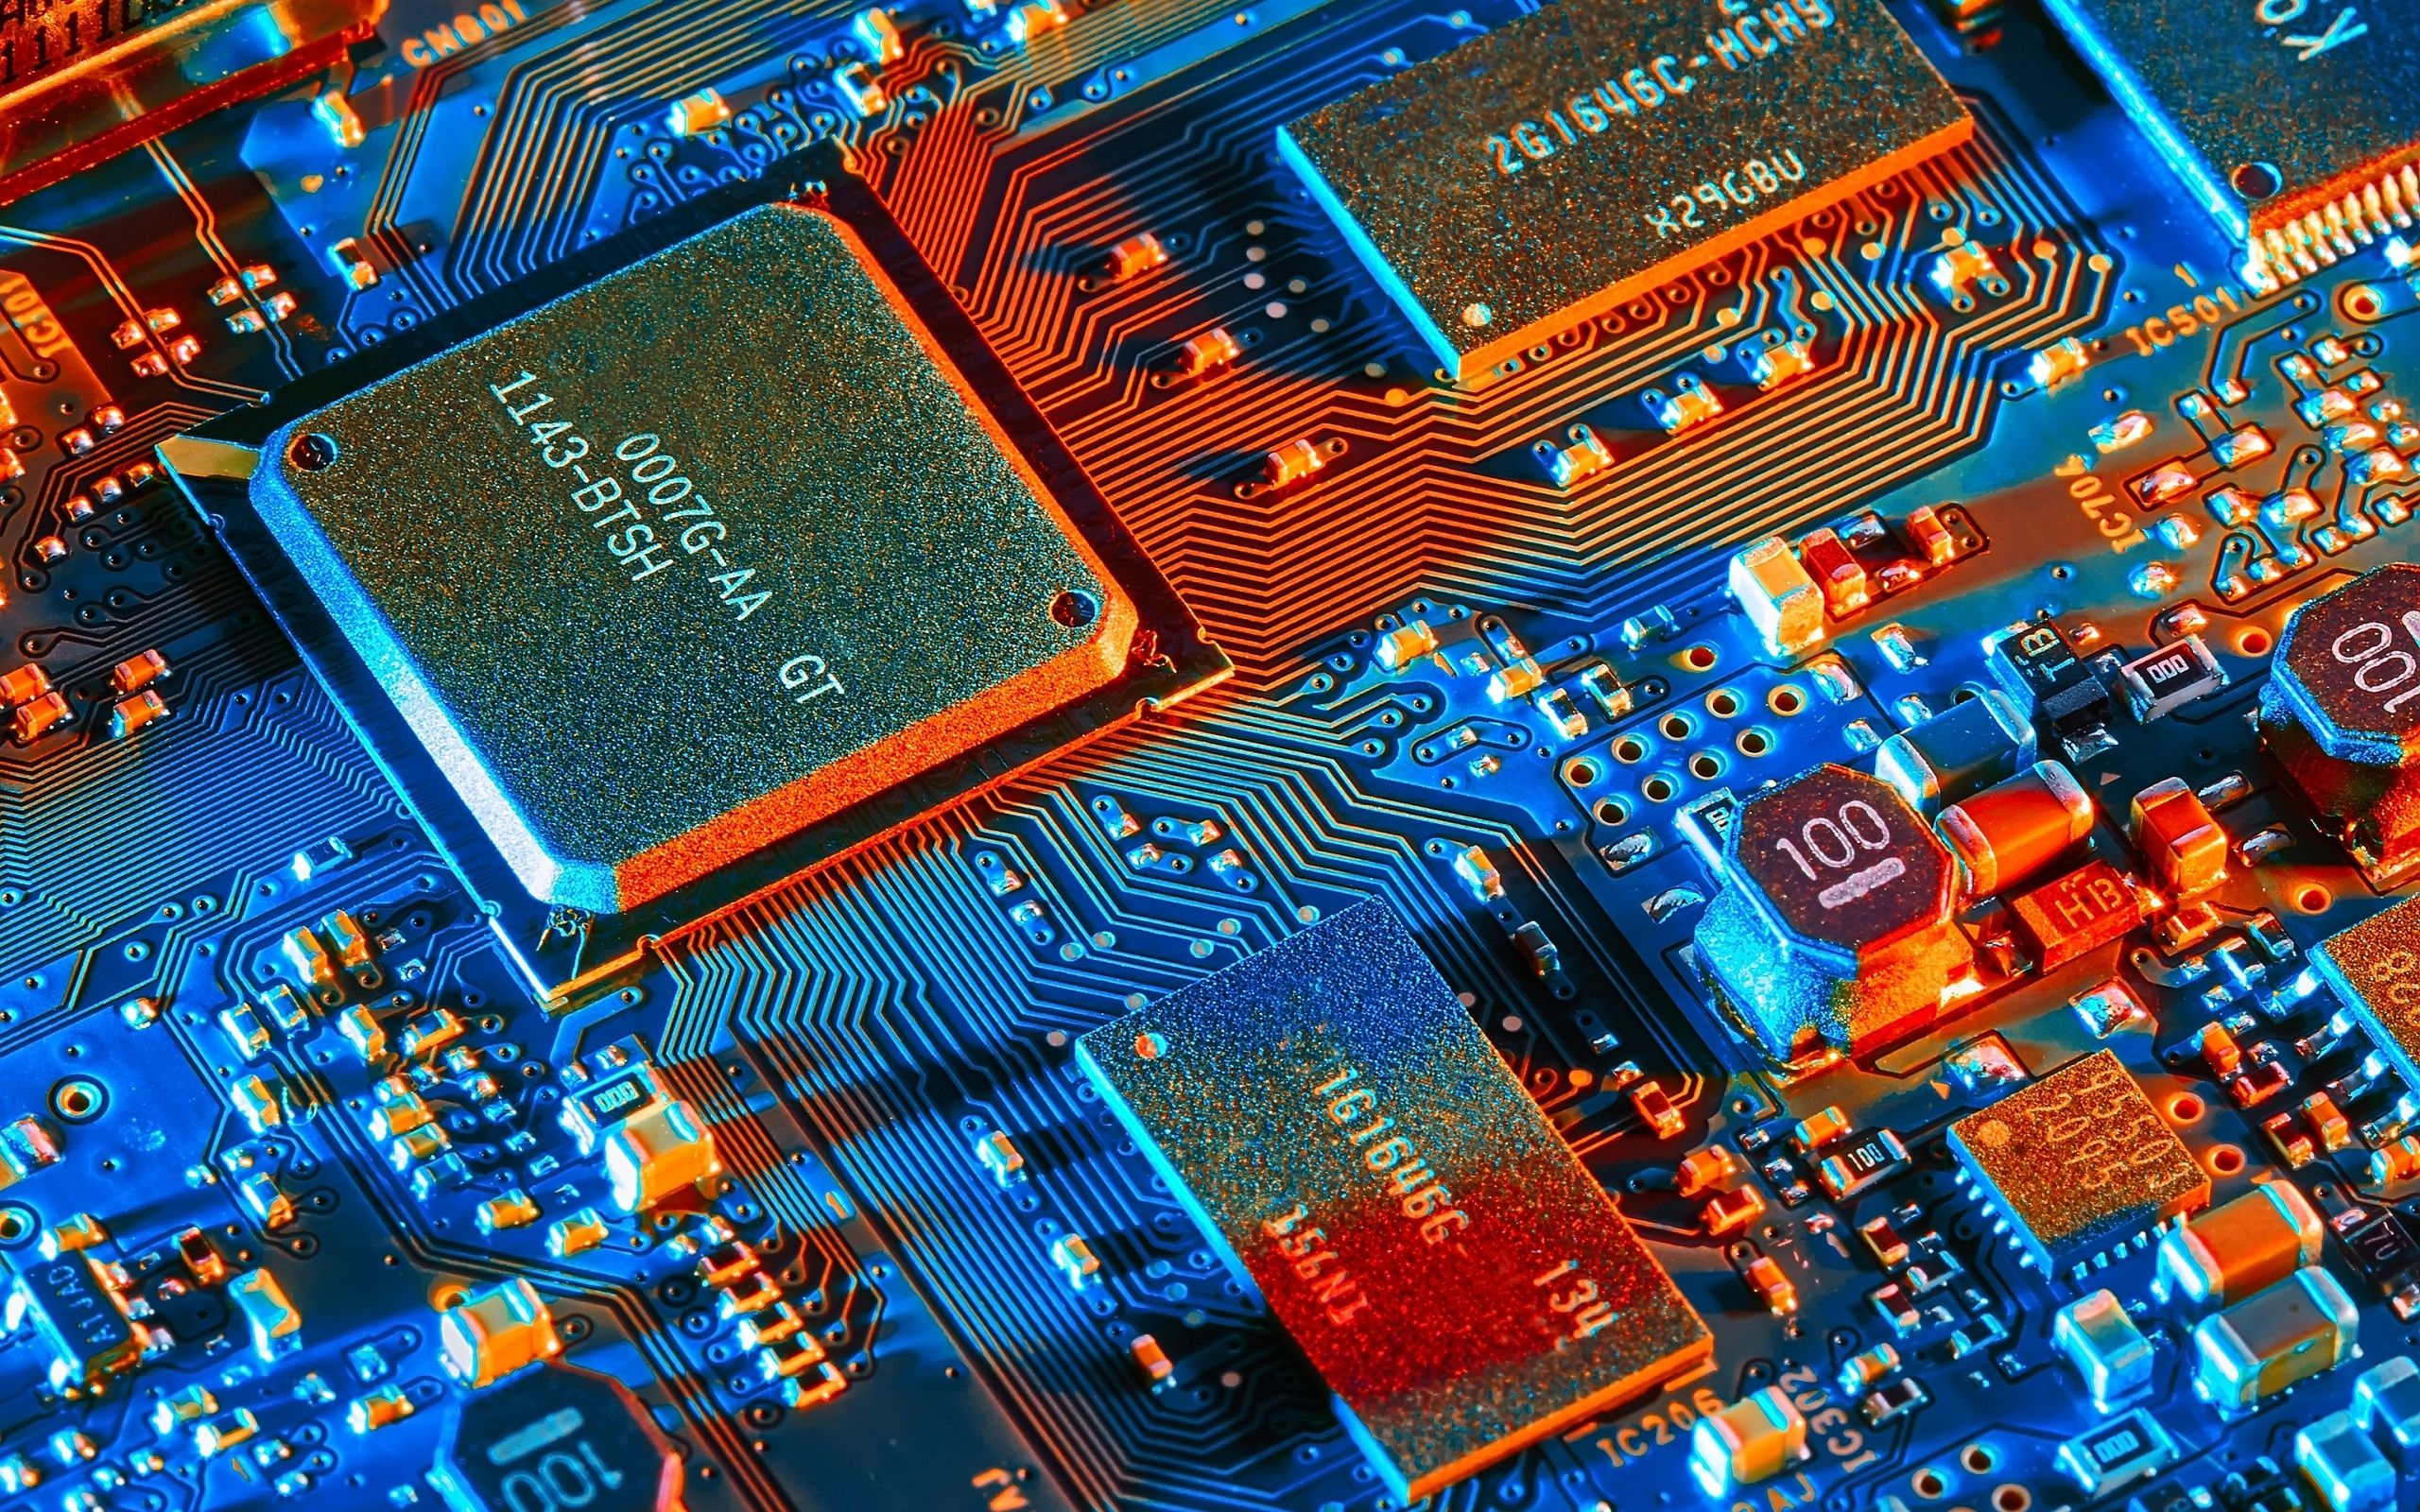 54 Best Free Electronics Wallpapers Wallpaperaccess Circuit Components Symbols Pinterest 1024x768 Digital Wallpaper Electronic